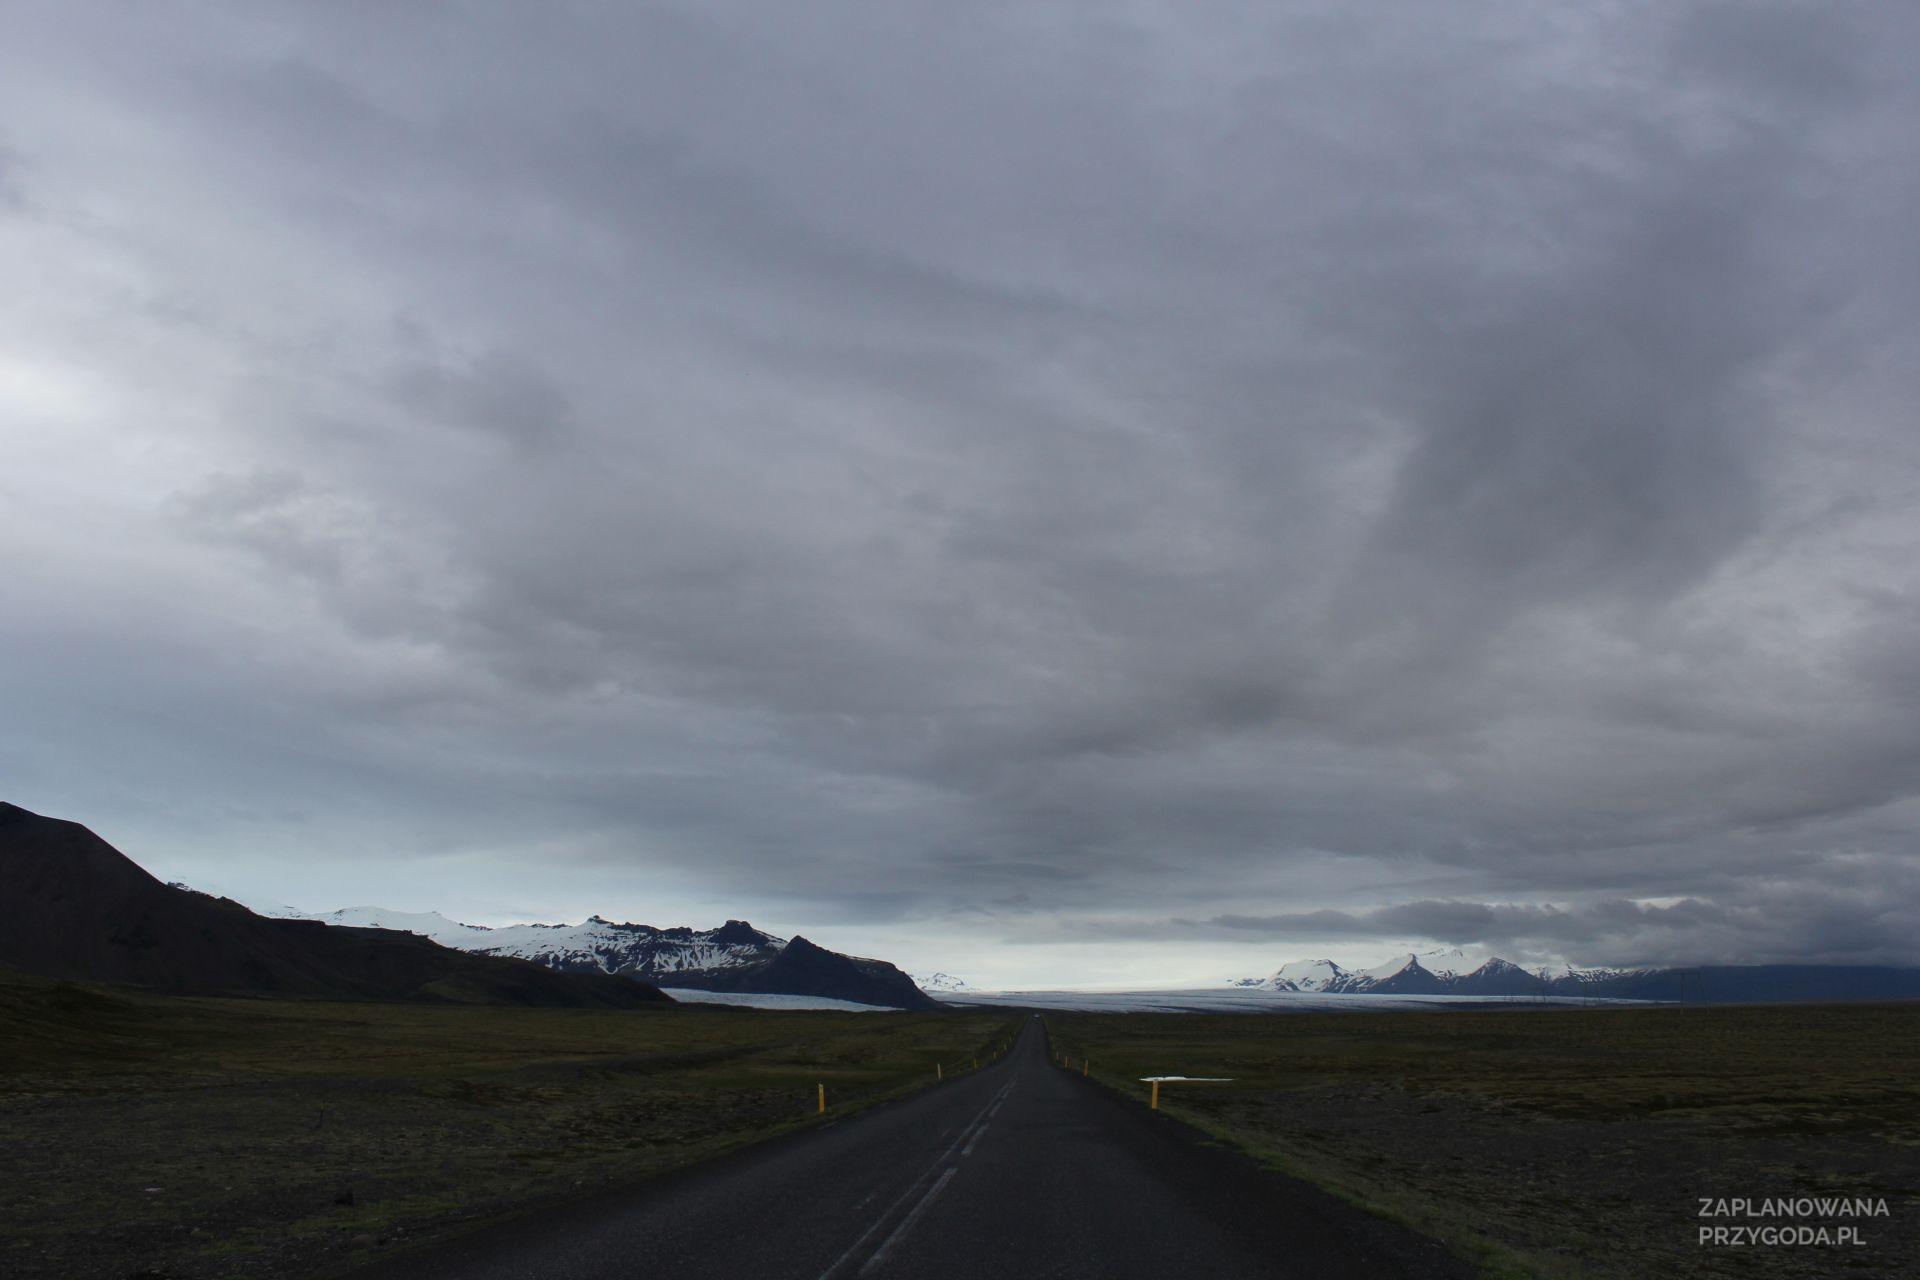 islandia_3-10-2014_east_1